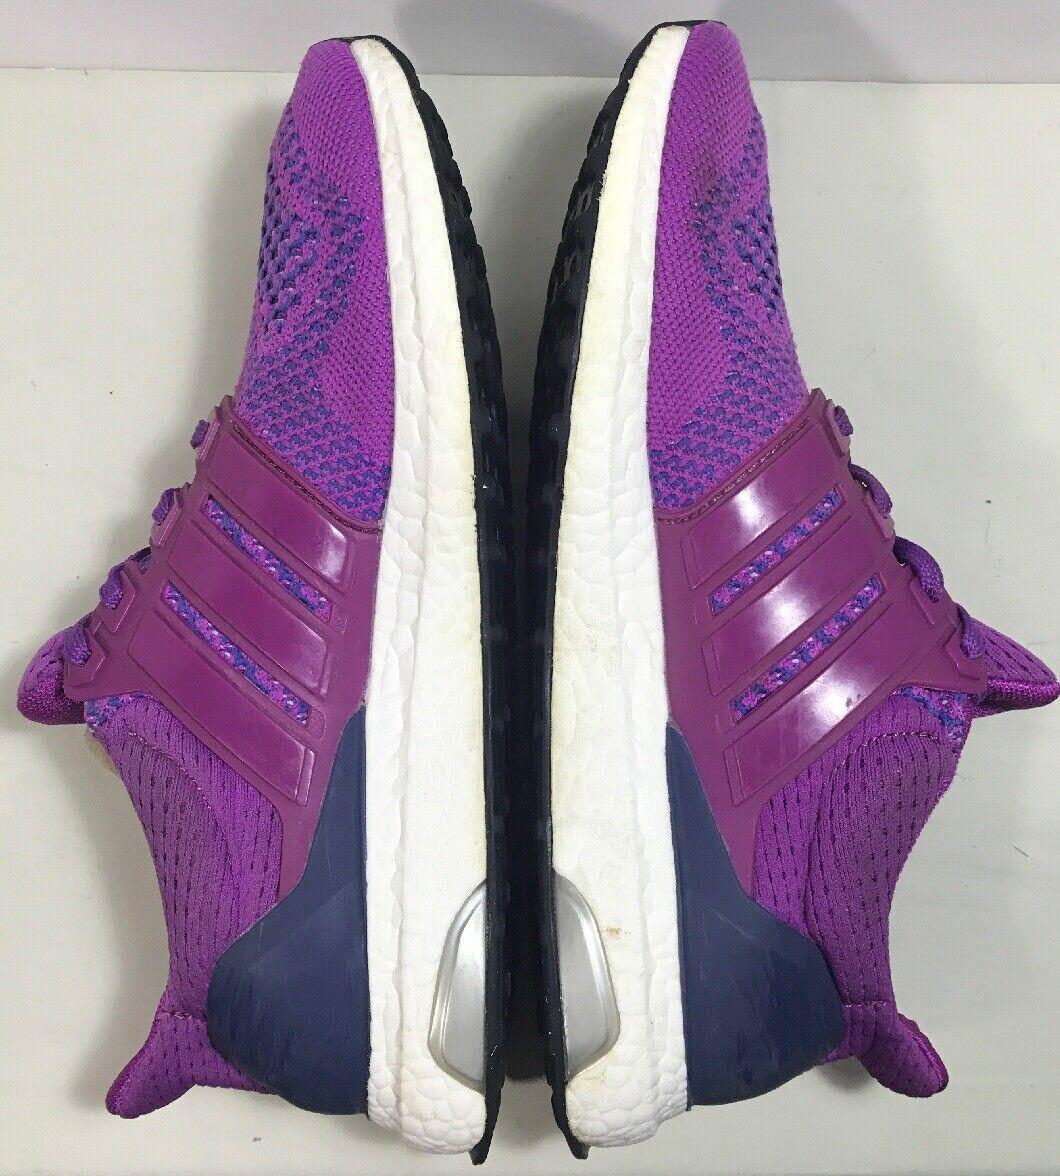 Wmns UltraBoost 1.0 'Flash Pink'